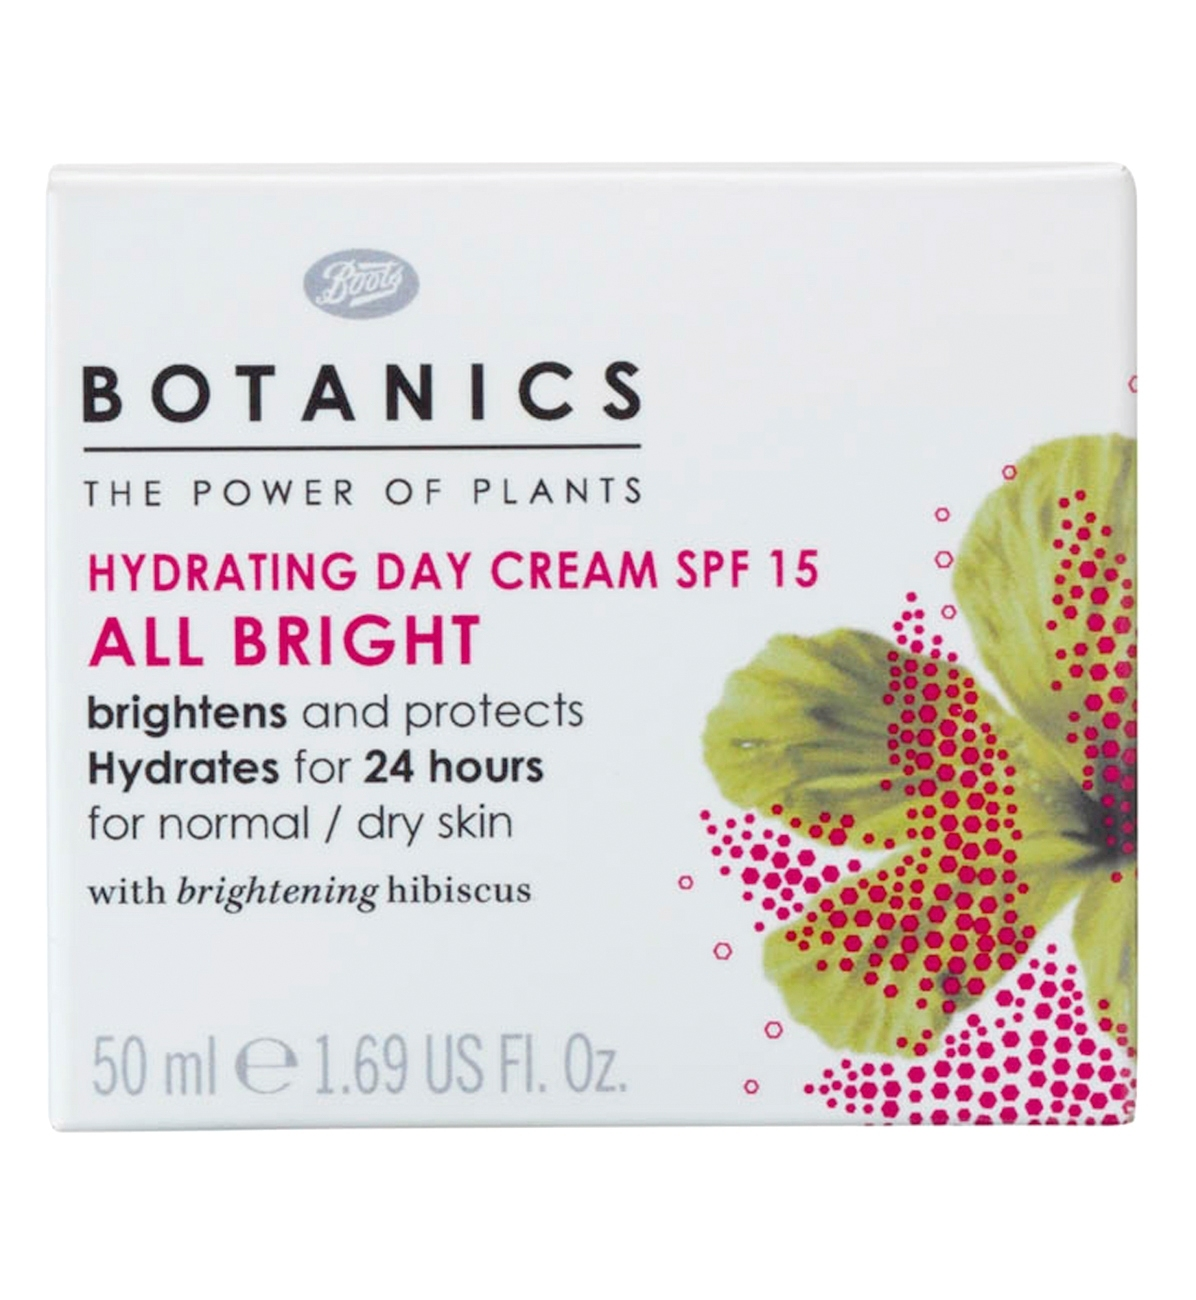 Botanics All Bright Hydrating Day Cream SPF15 89kr-1